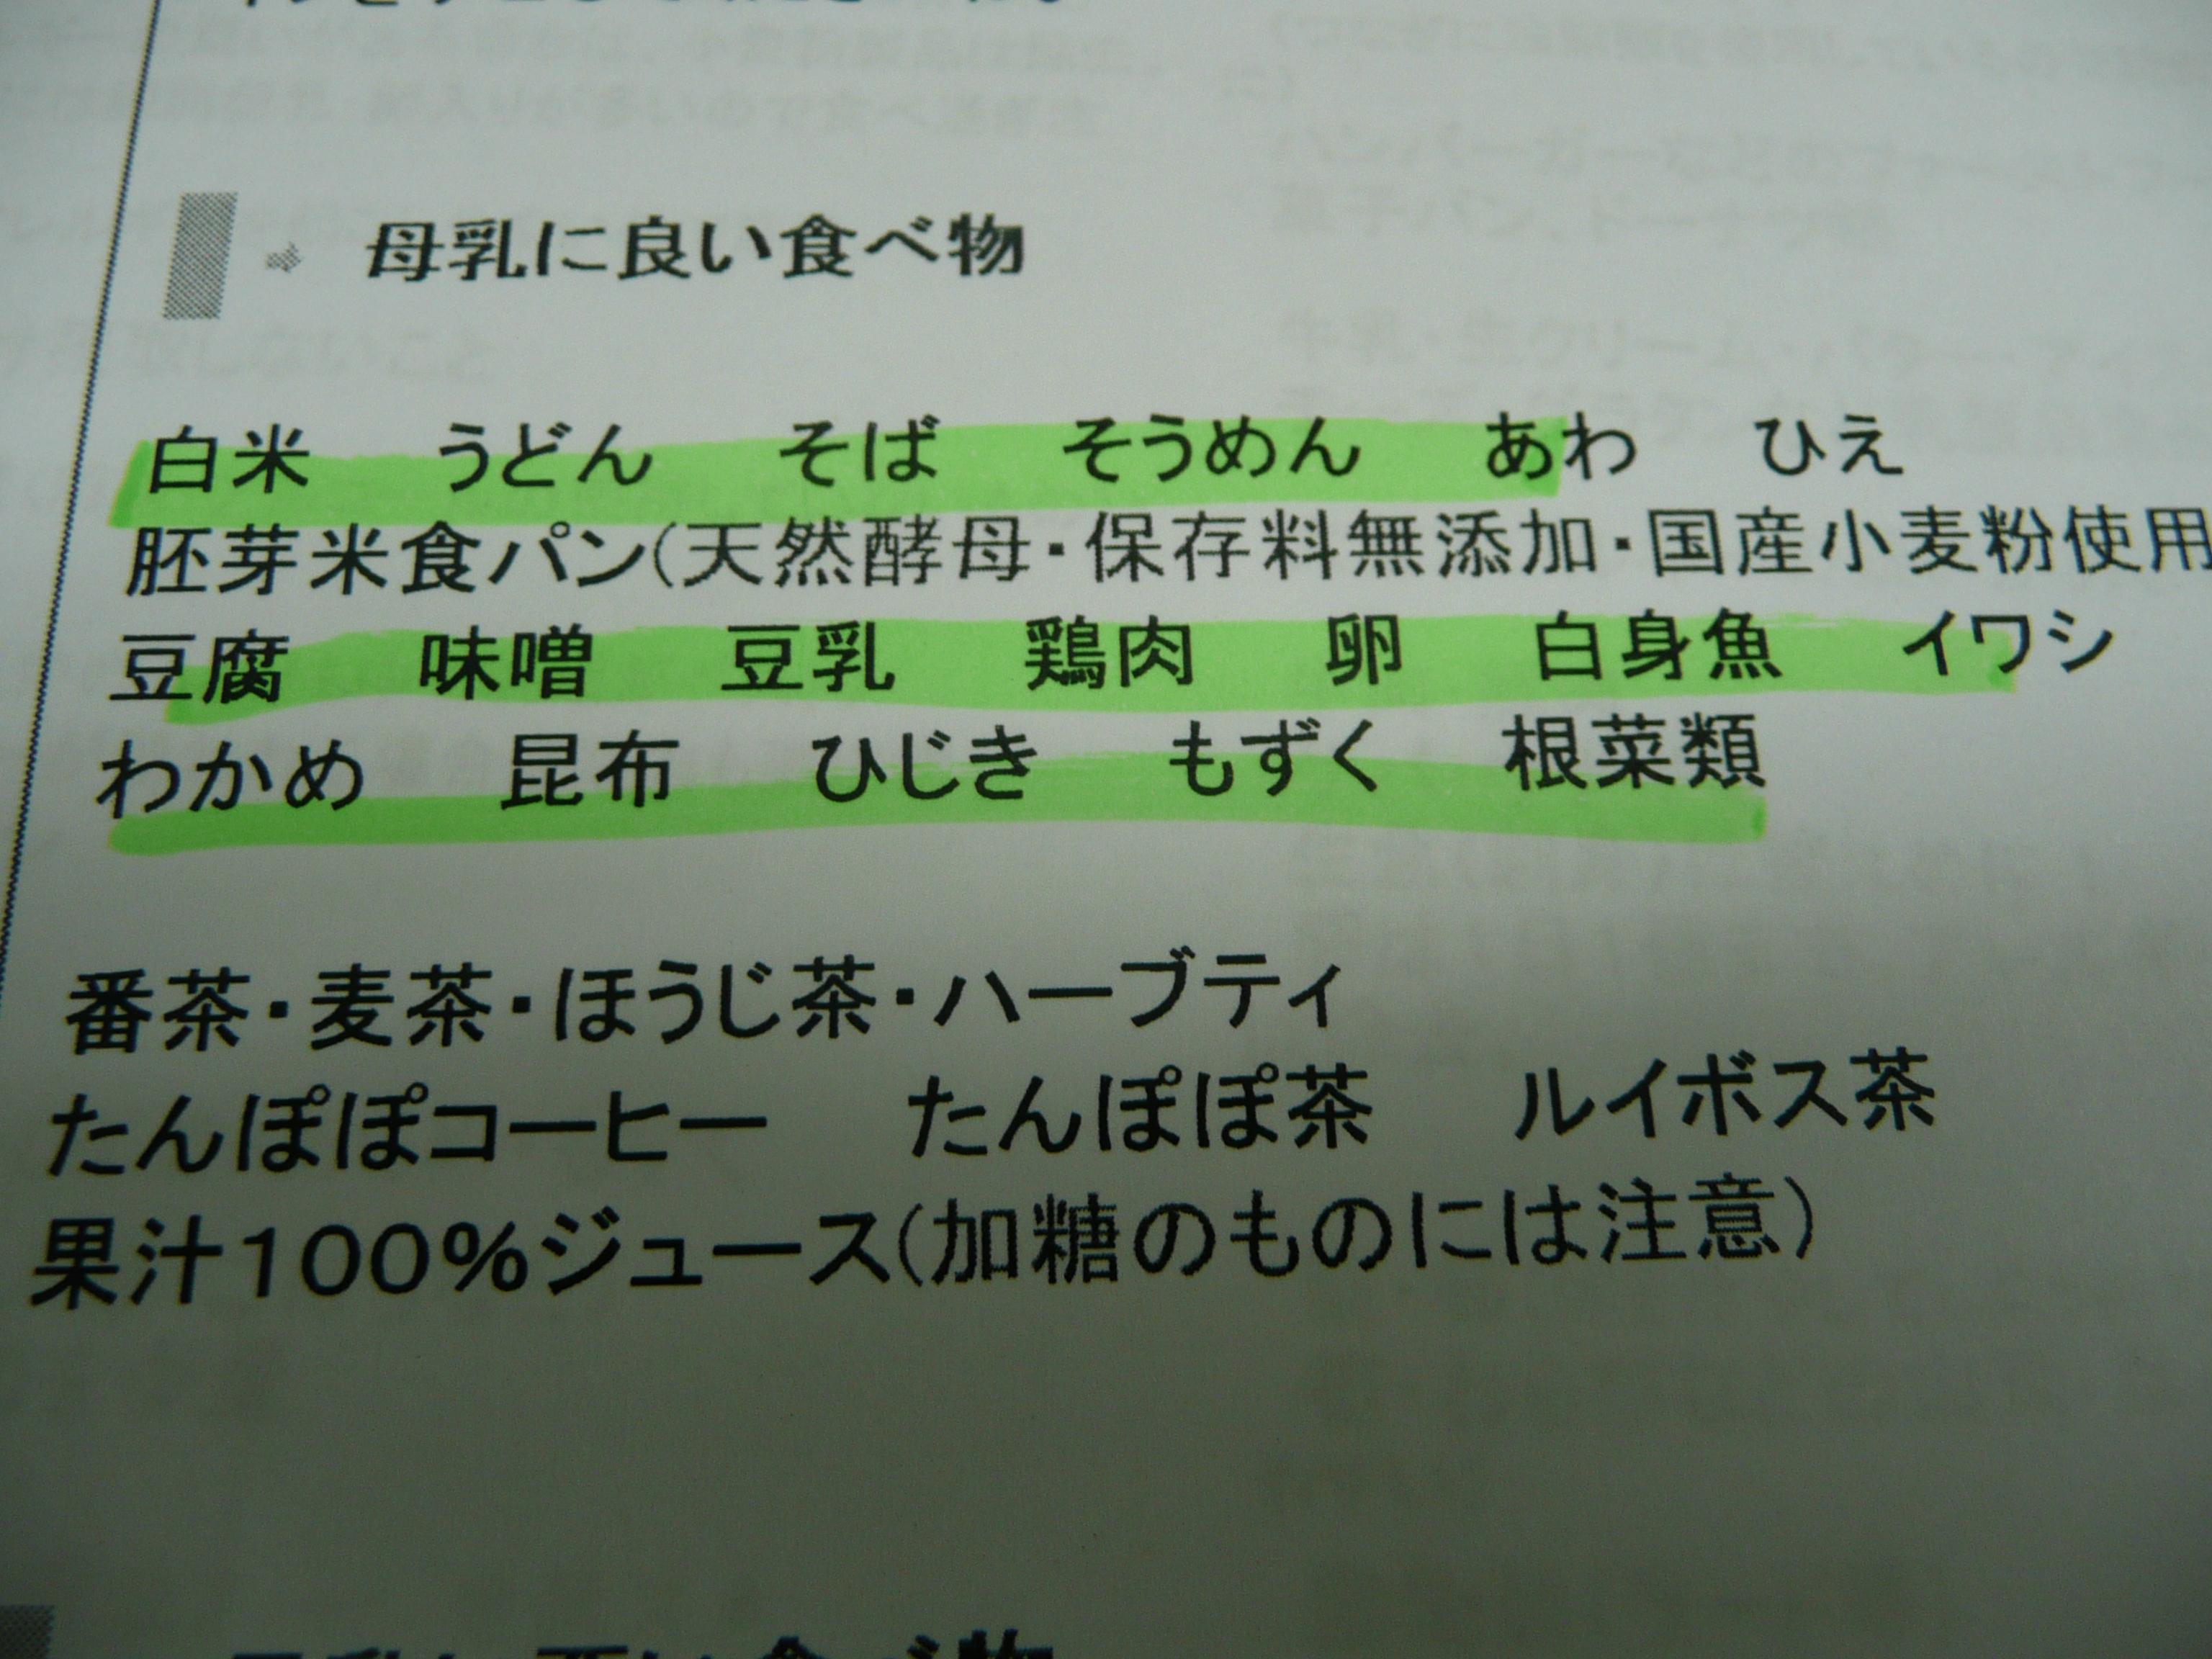 P1050301.JPG